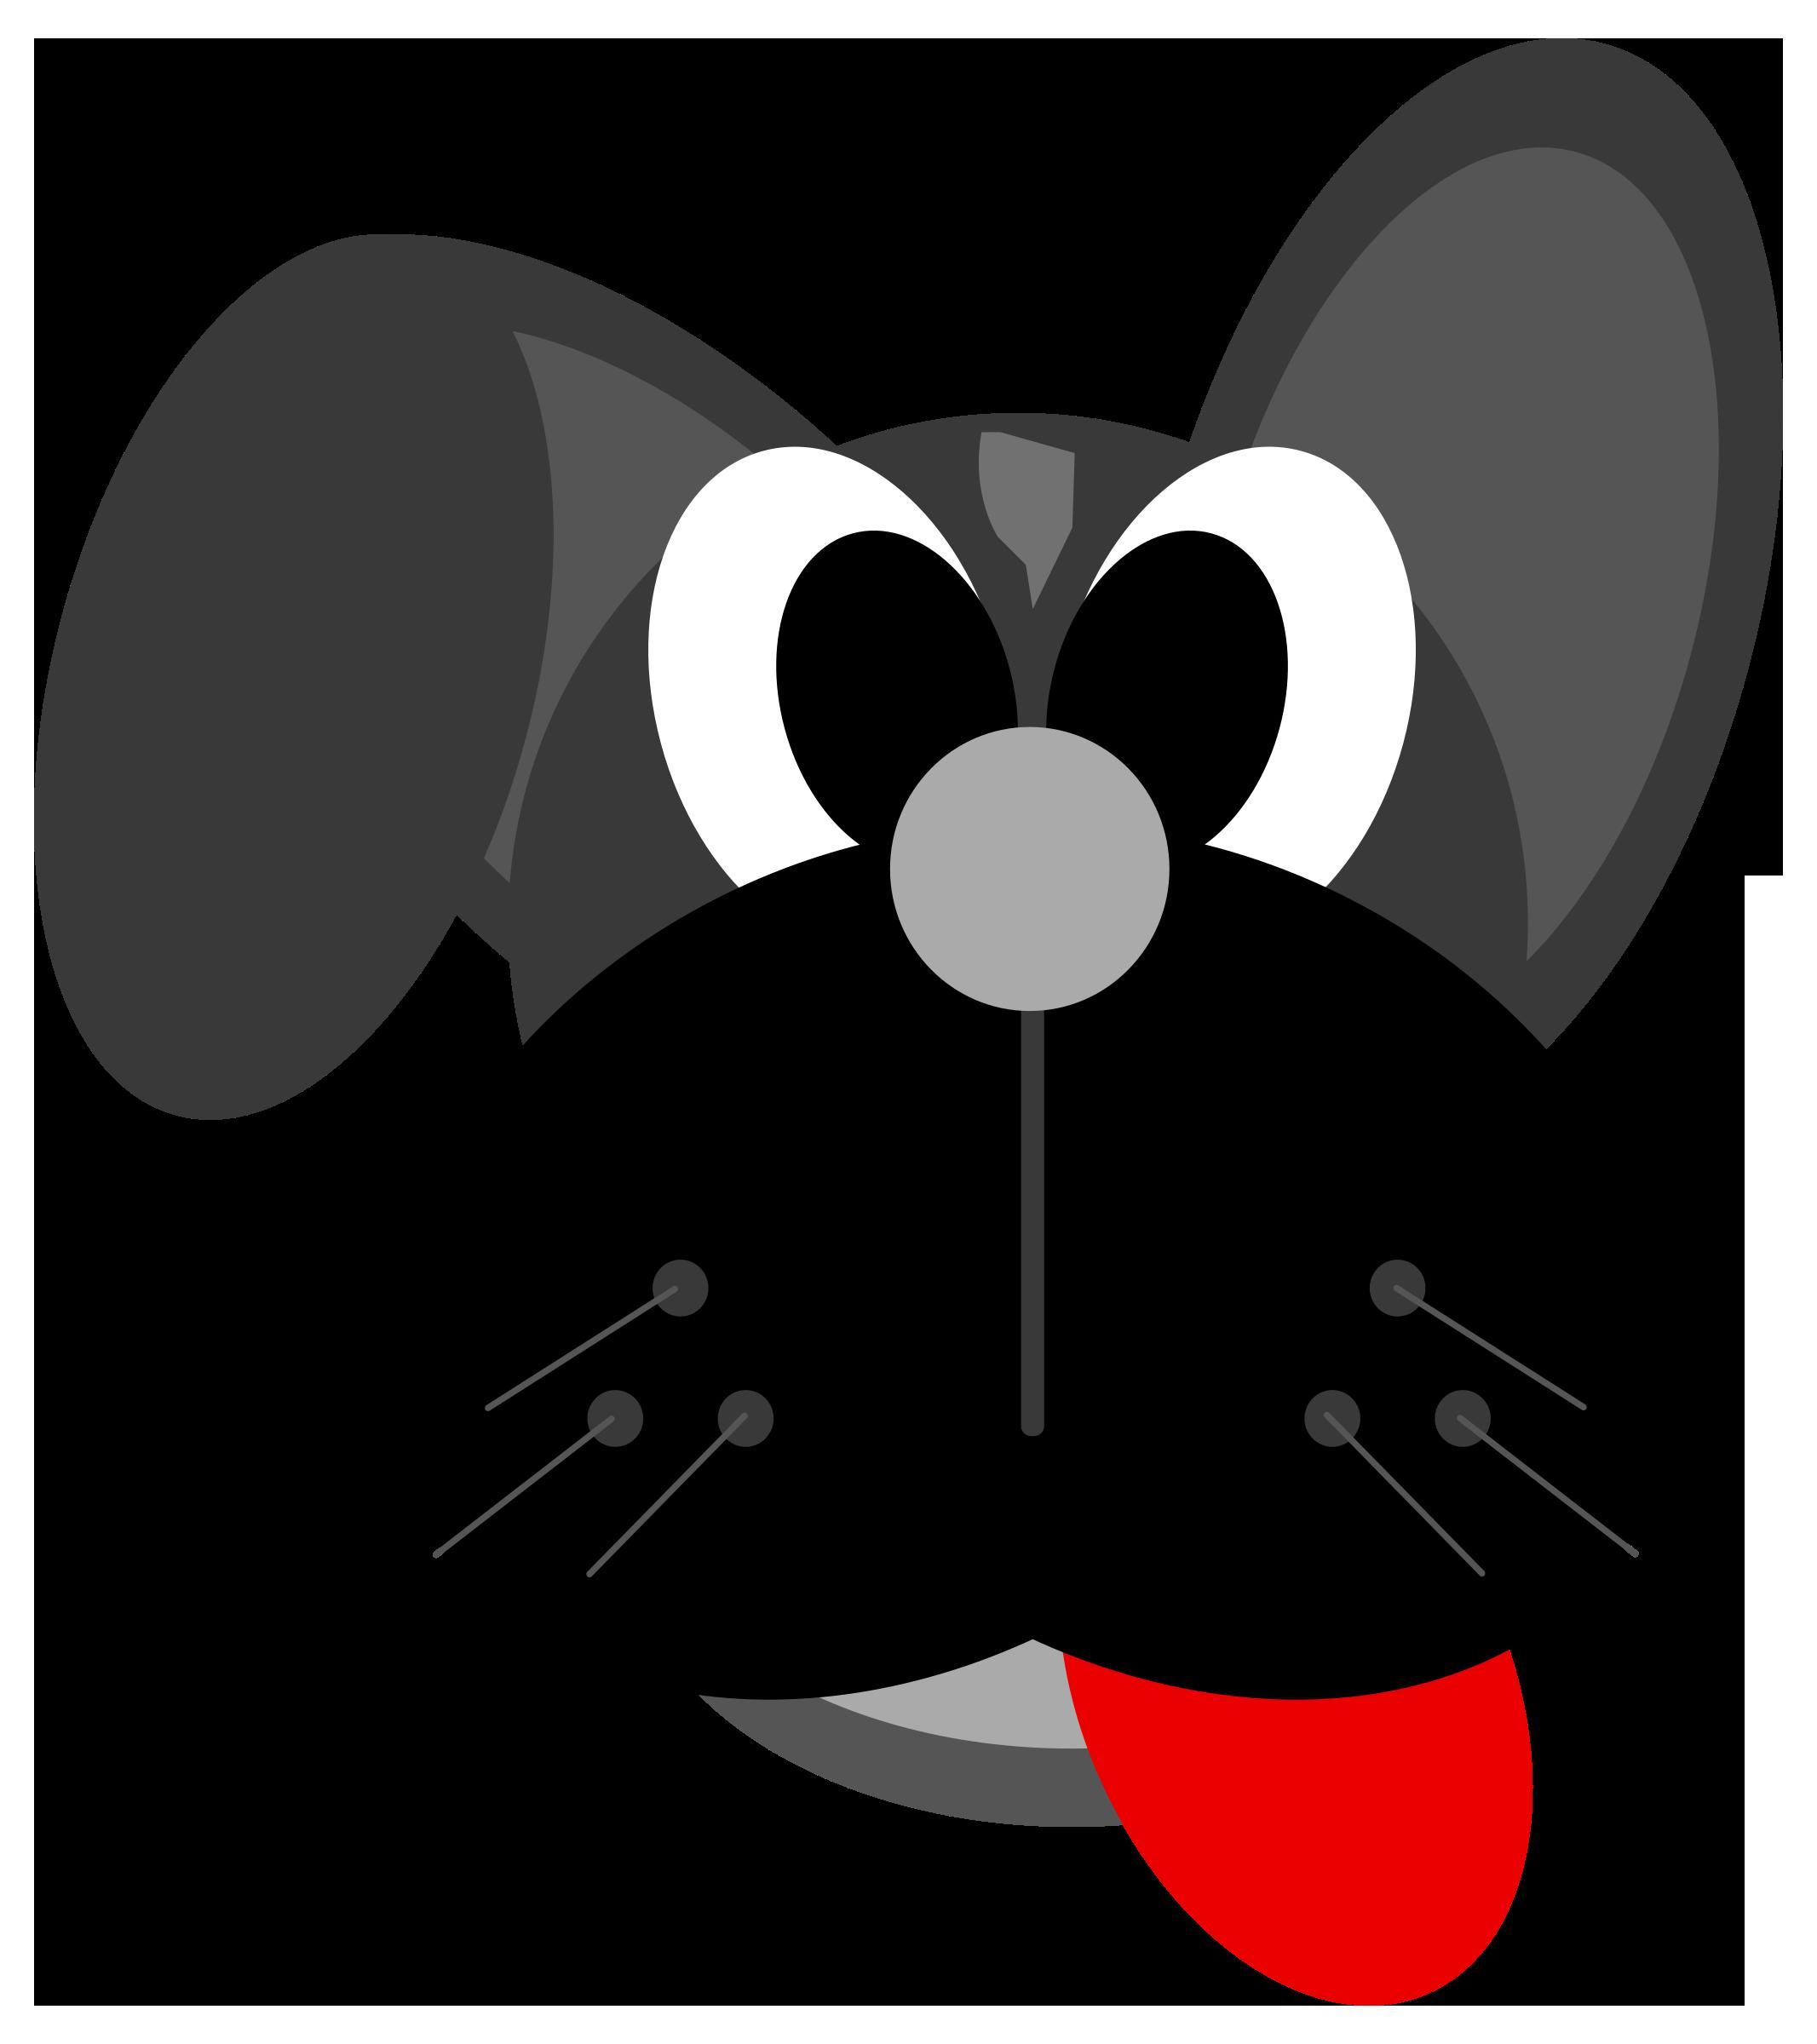 Dog Cartoon Vector Clipart image - Free stock photo ...